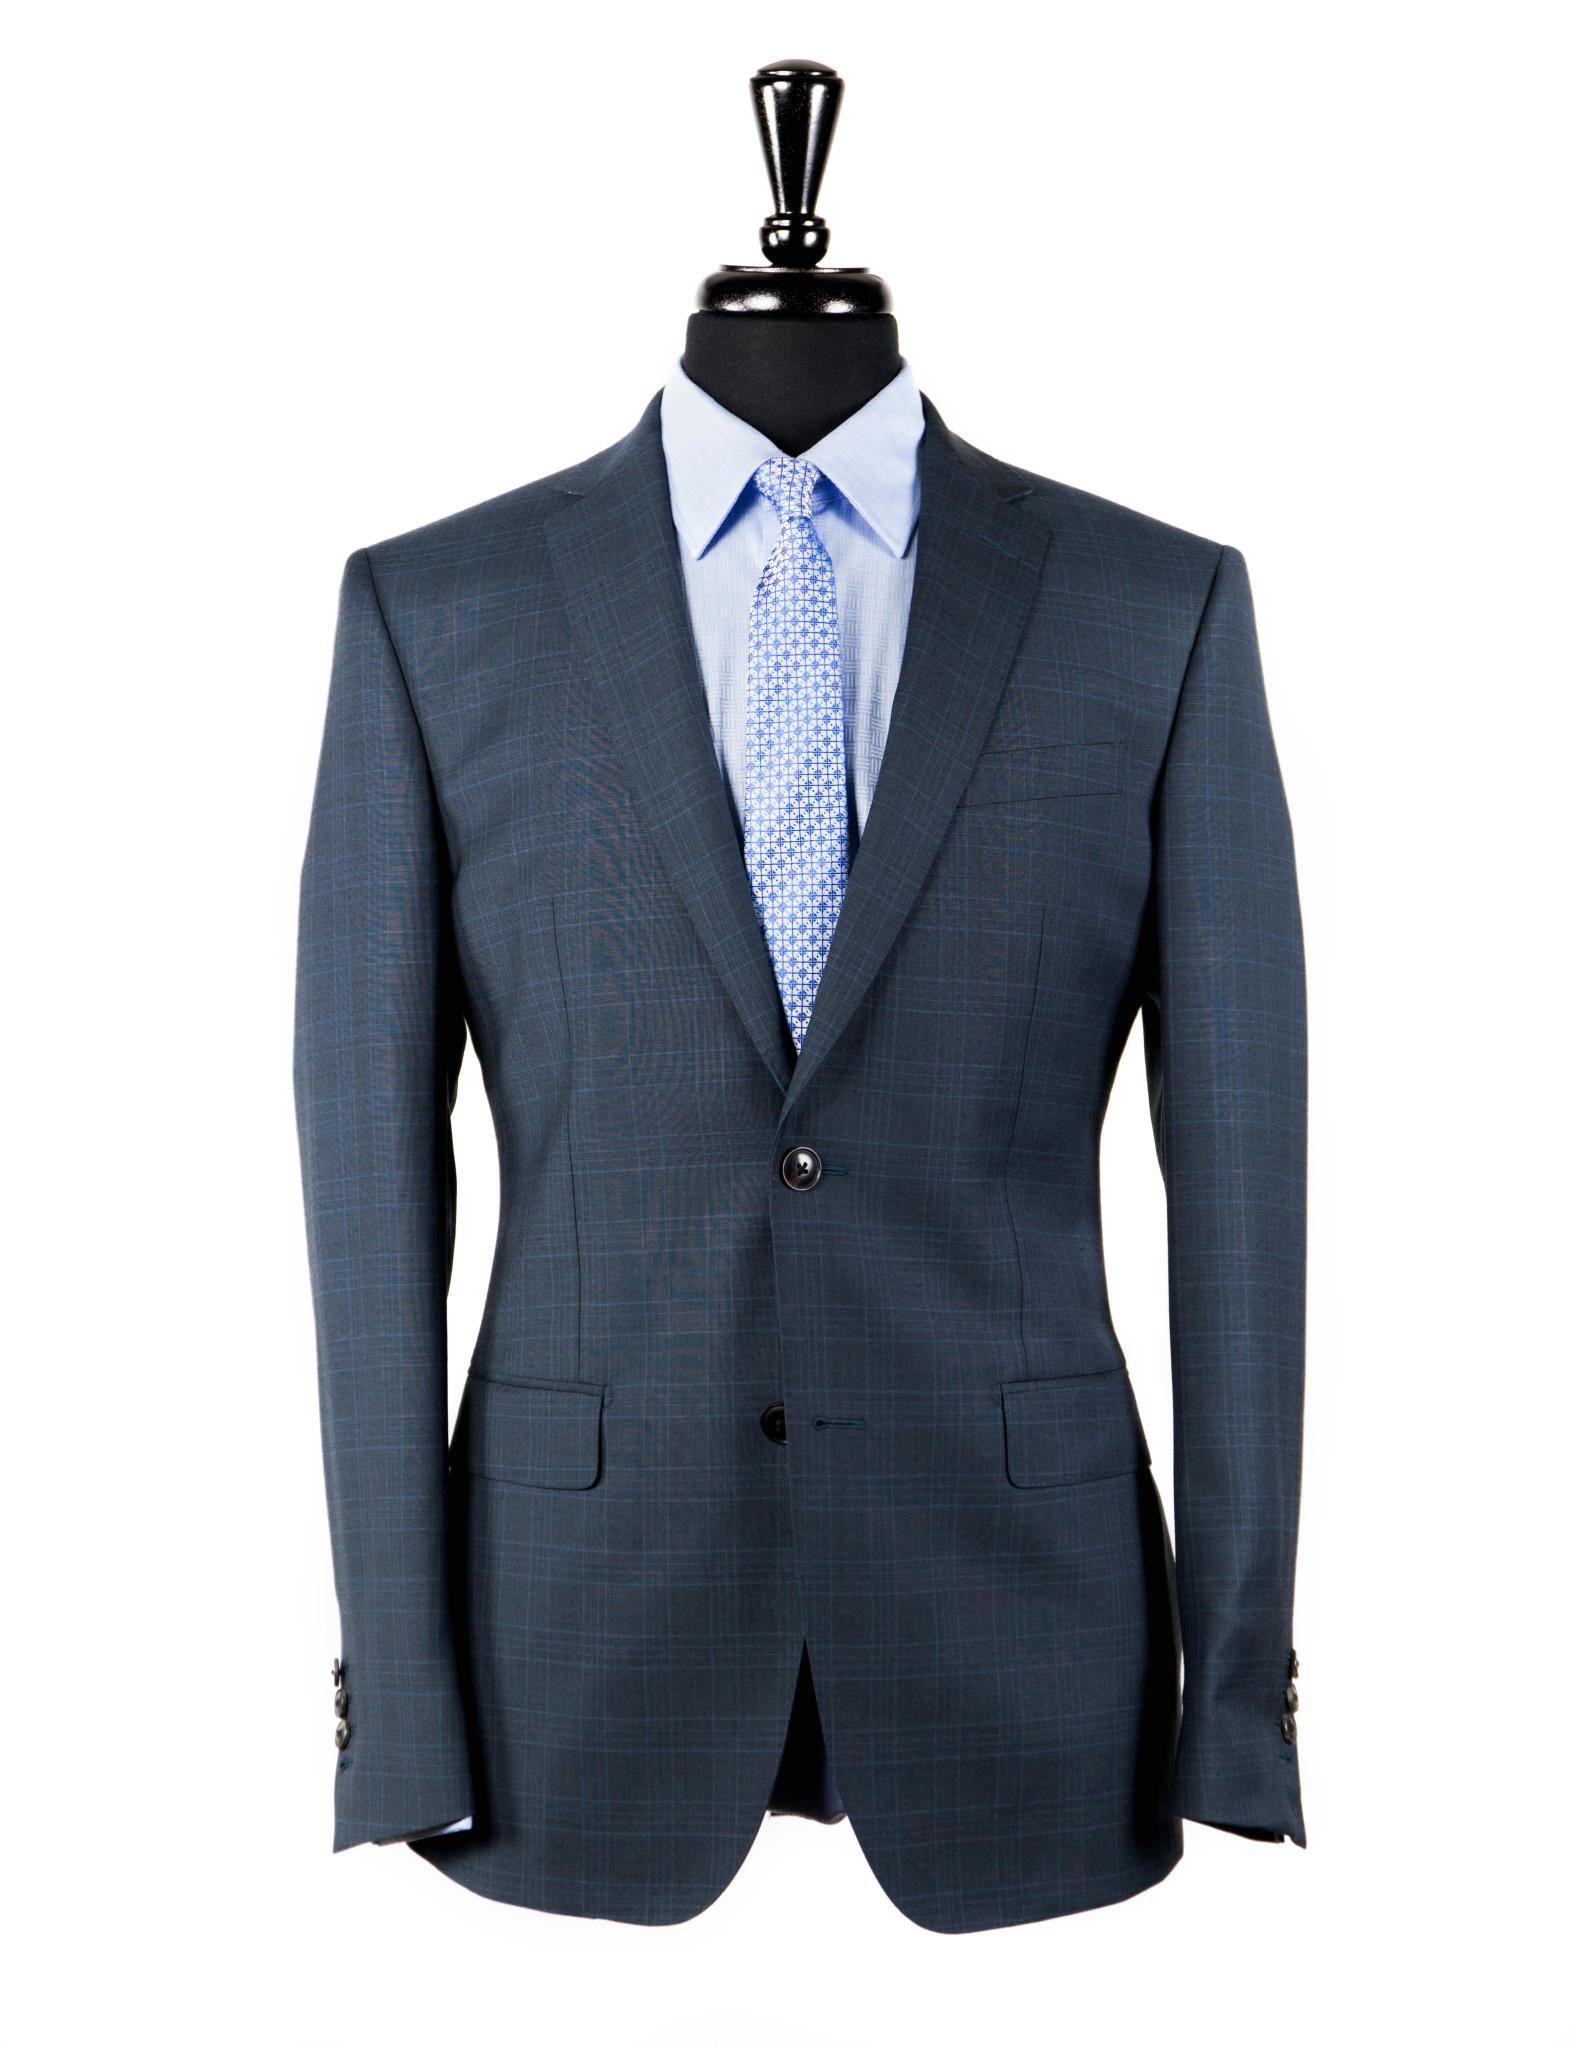 Adder S130s Suit-1